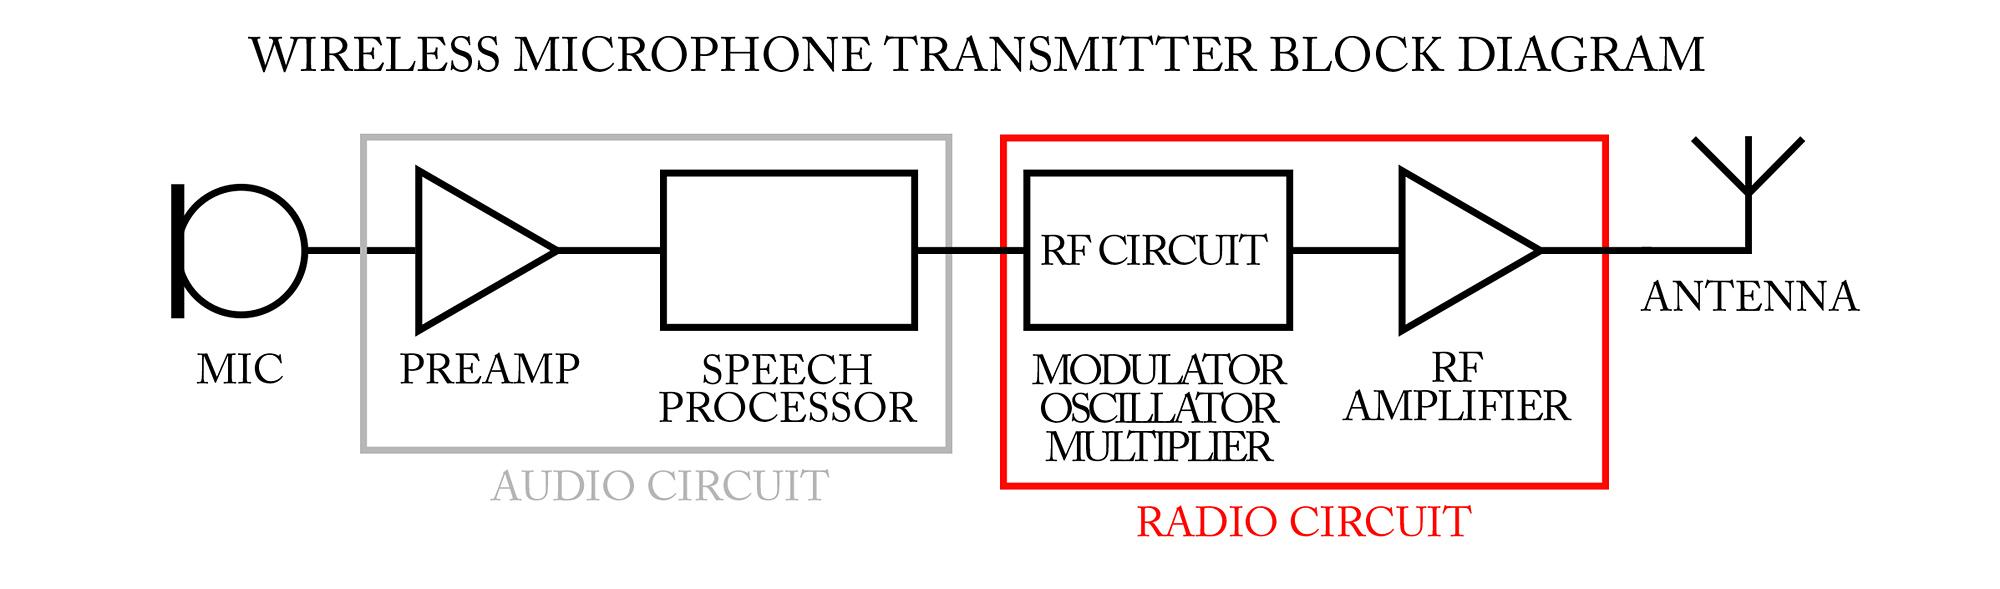 wireless microphone circuit diagram